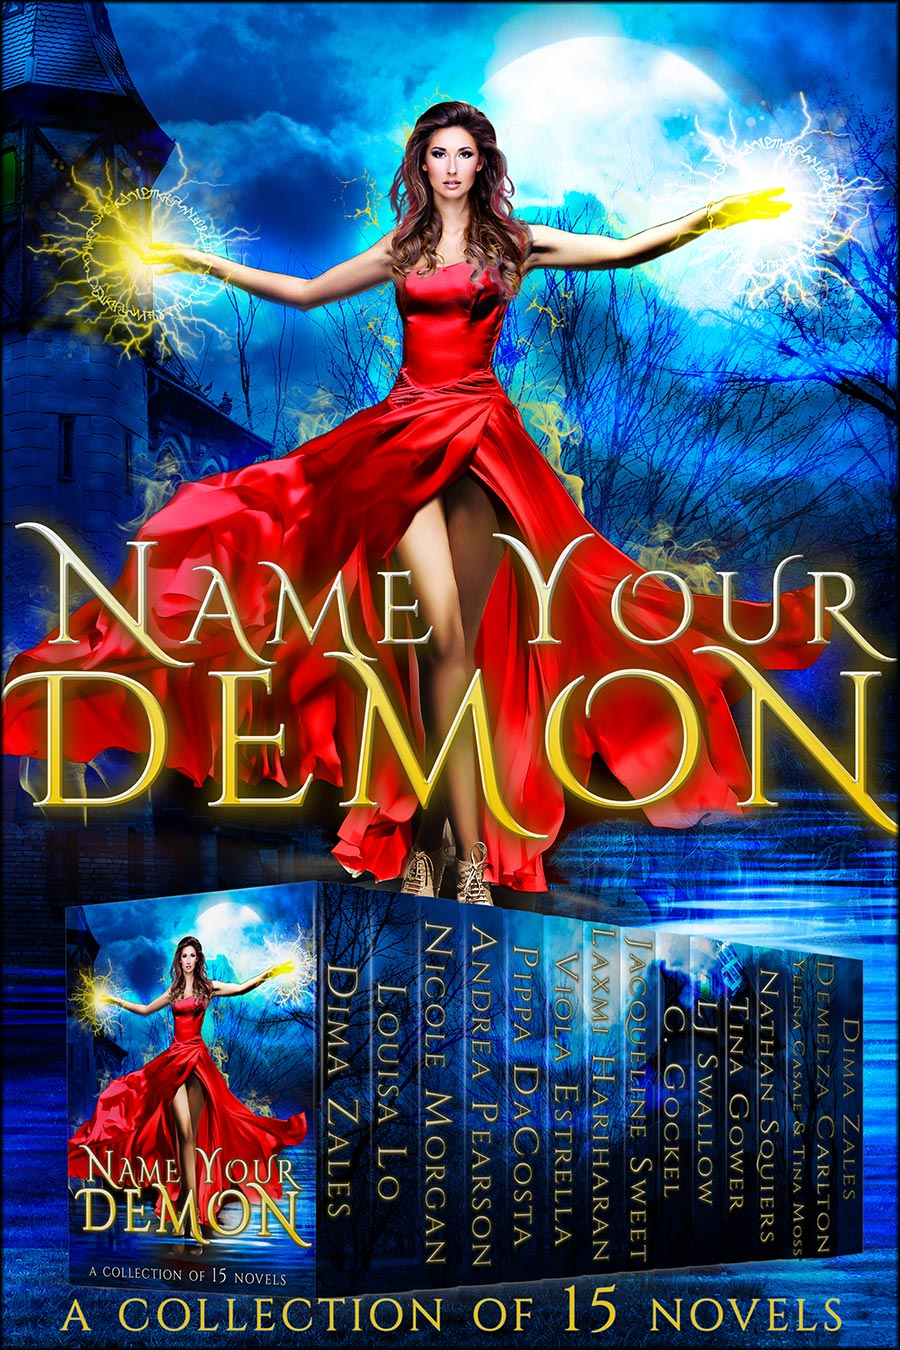 Name-Your-Demon---FINAL.jpg